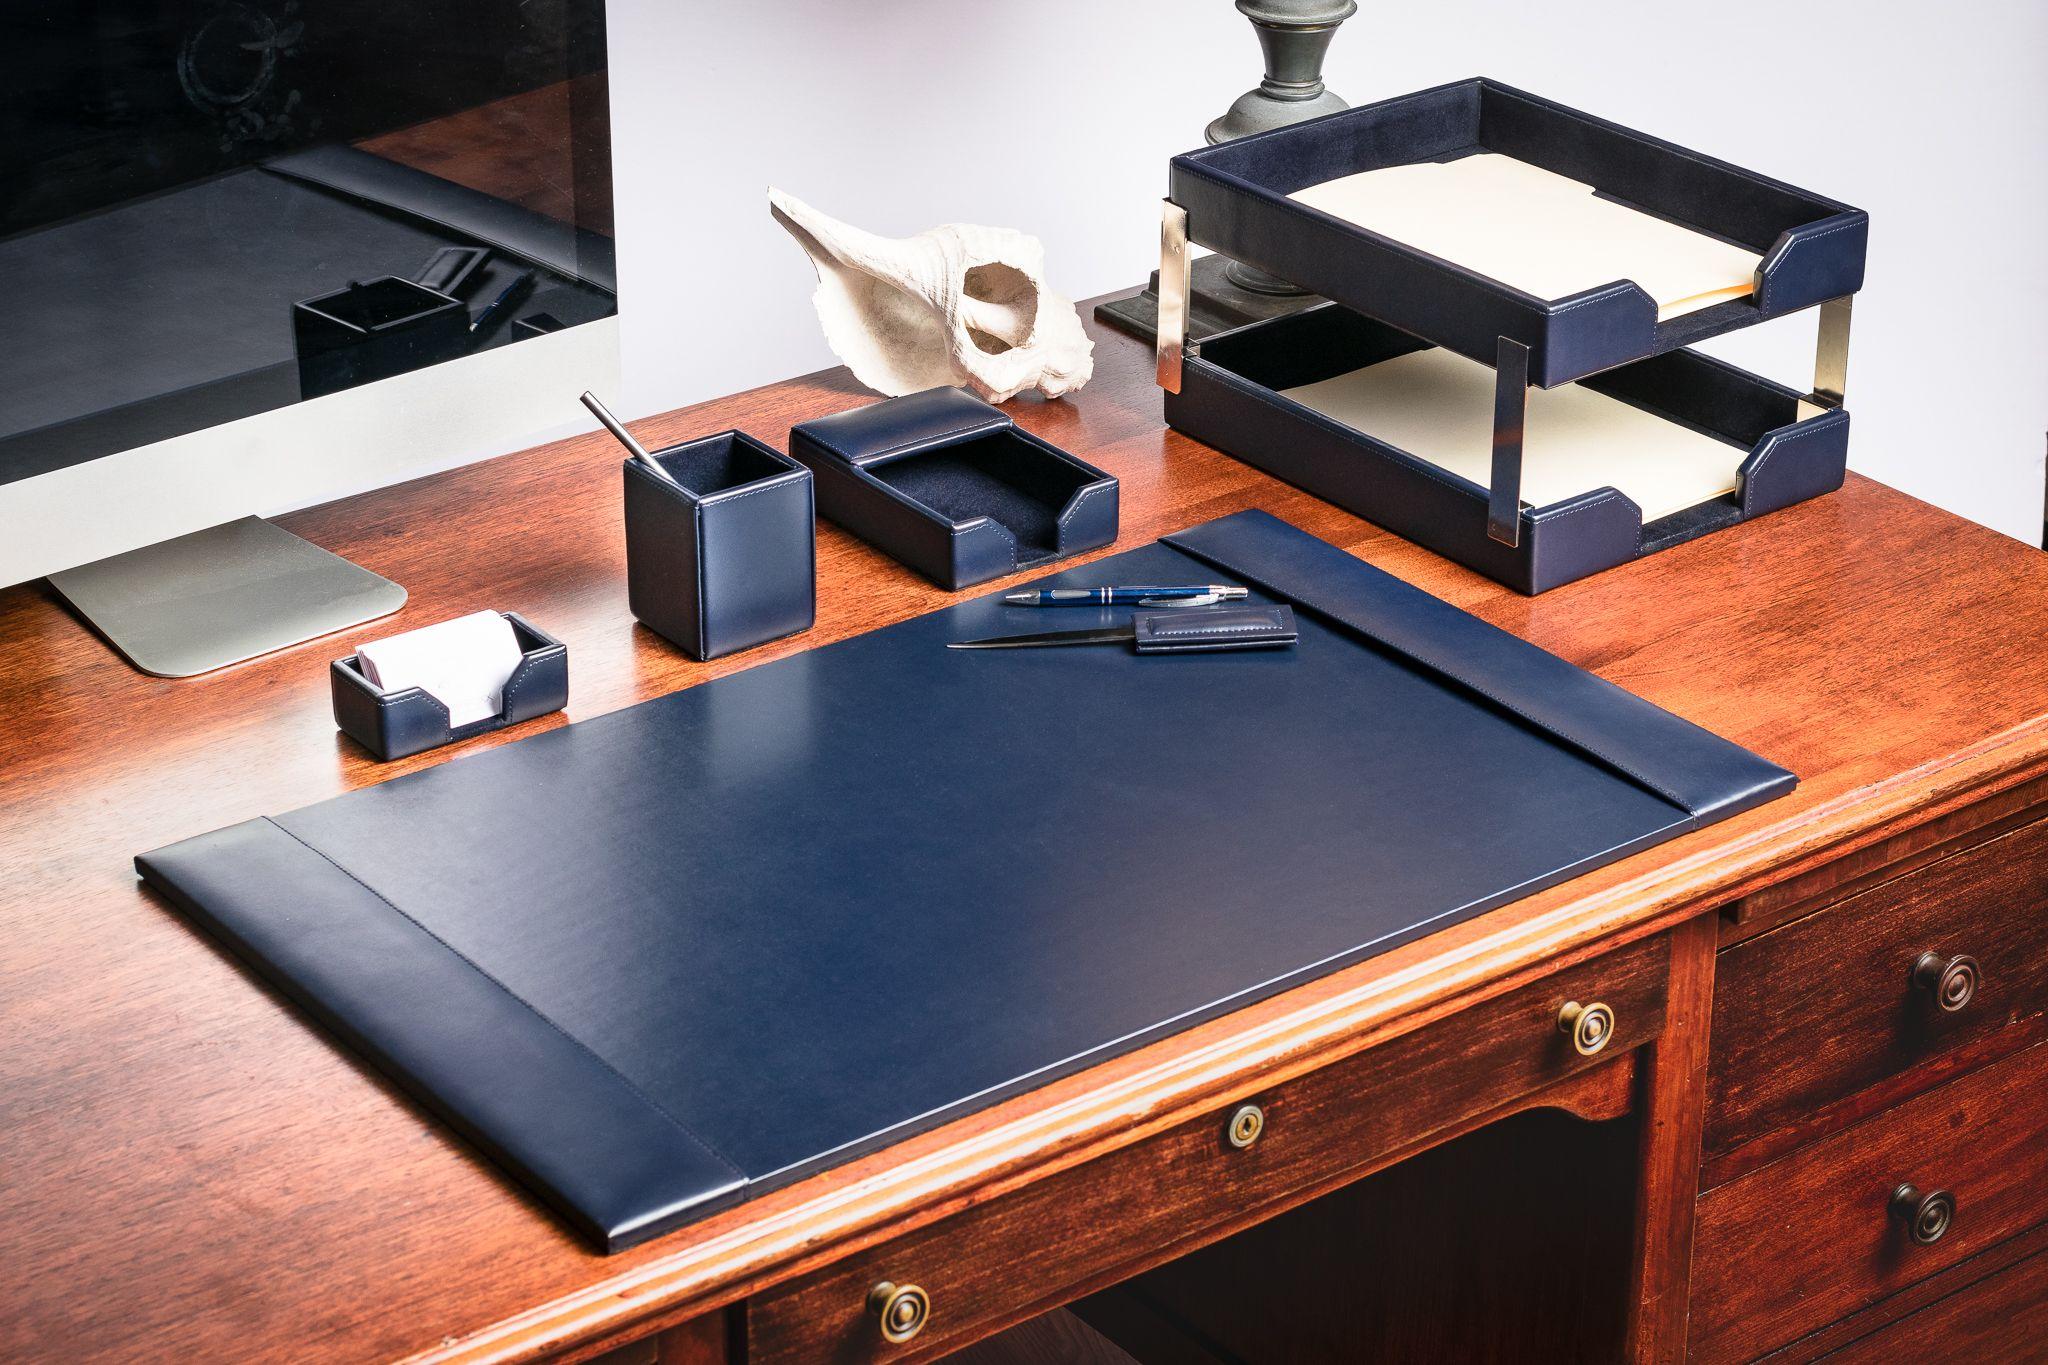 Navy Blue Bonded Leather Desk Set 8pc Leather Desk Desk Organizer Set Leather Desk Accessories